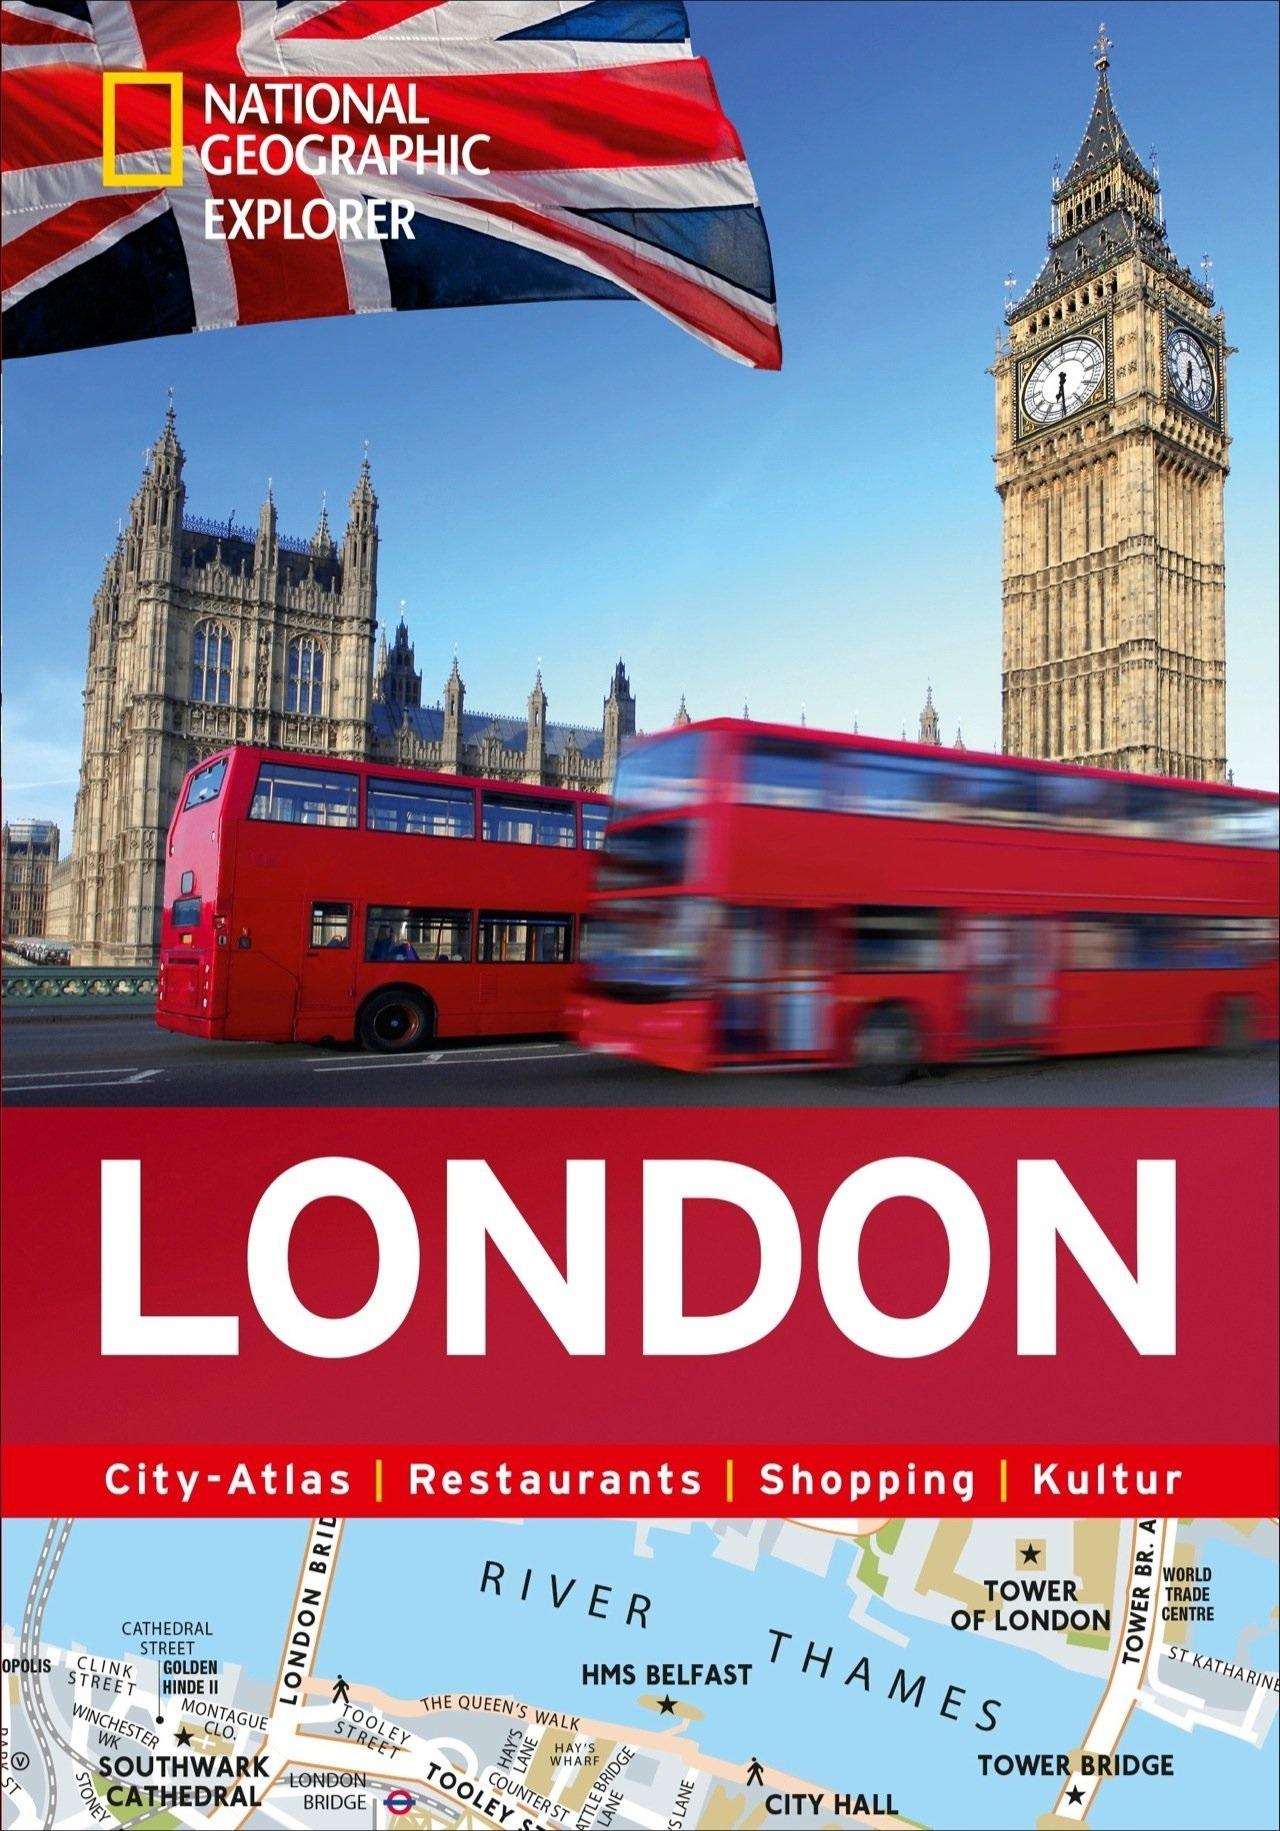 National Geographic Explorer: London - City-Atl...